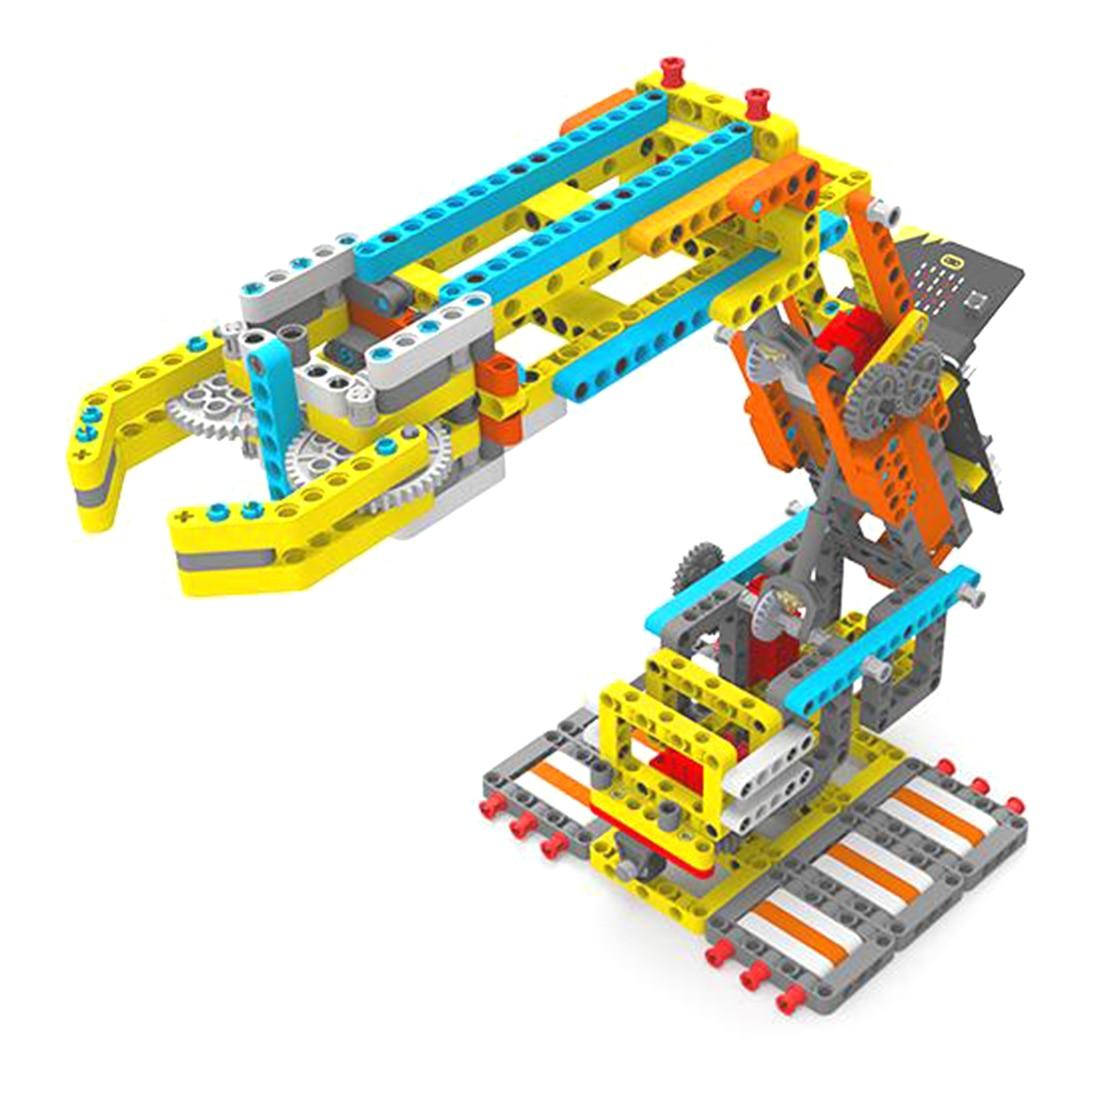 Micro:Bit Programmable Building Block DIY Smart Robotic Arm Kit Programable Toys For Men Kids Gift - Random Color